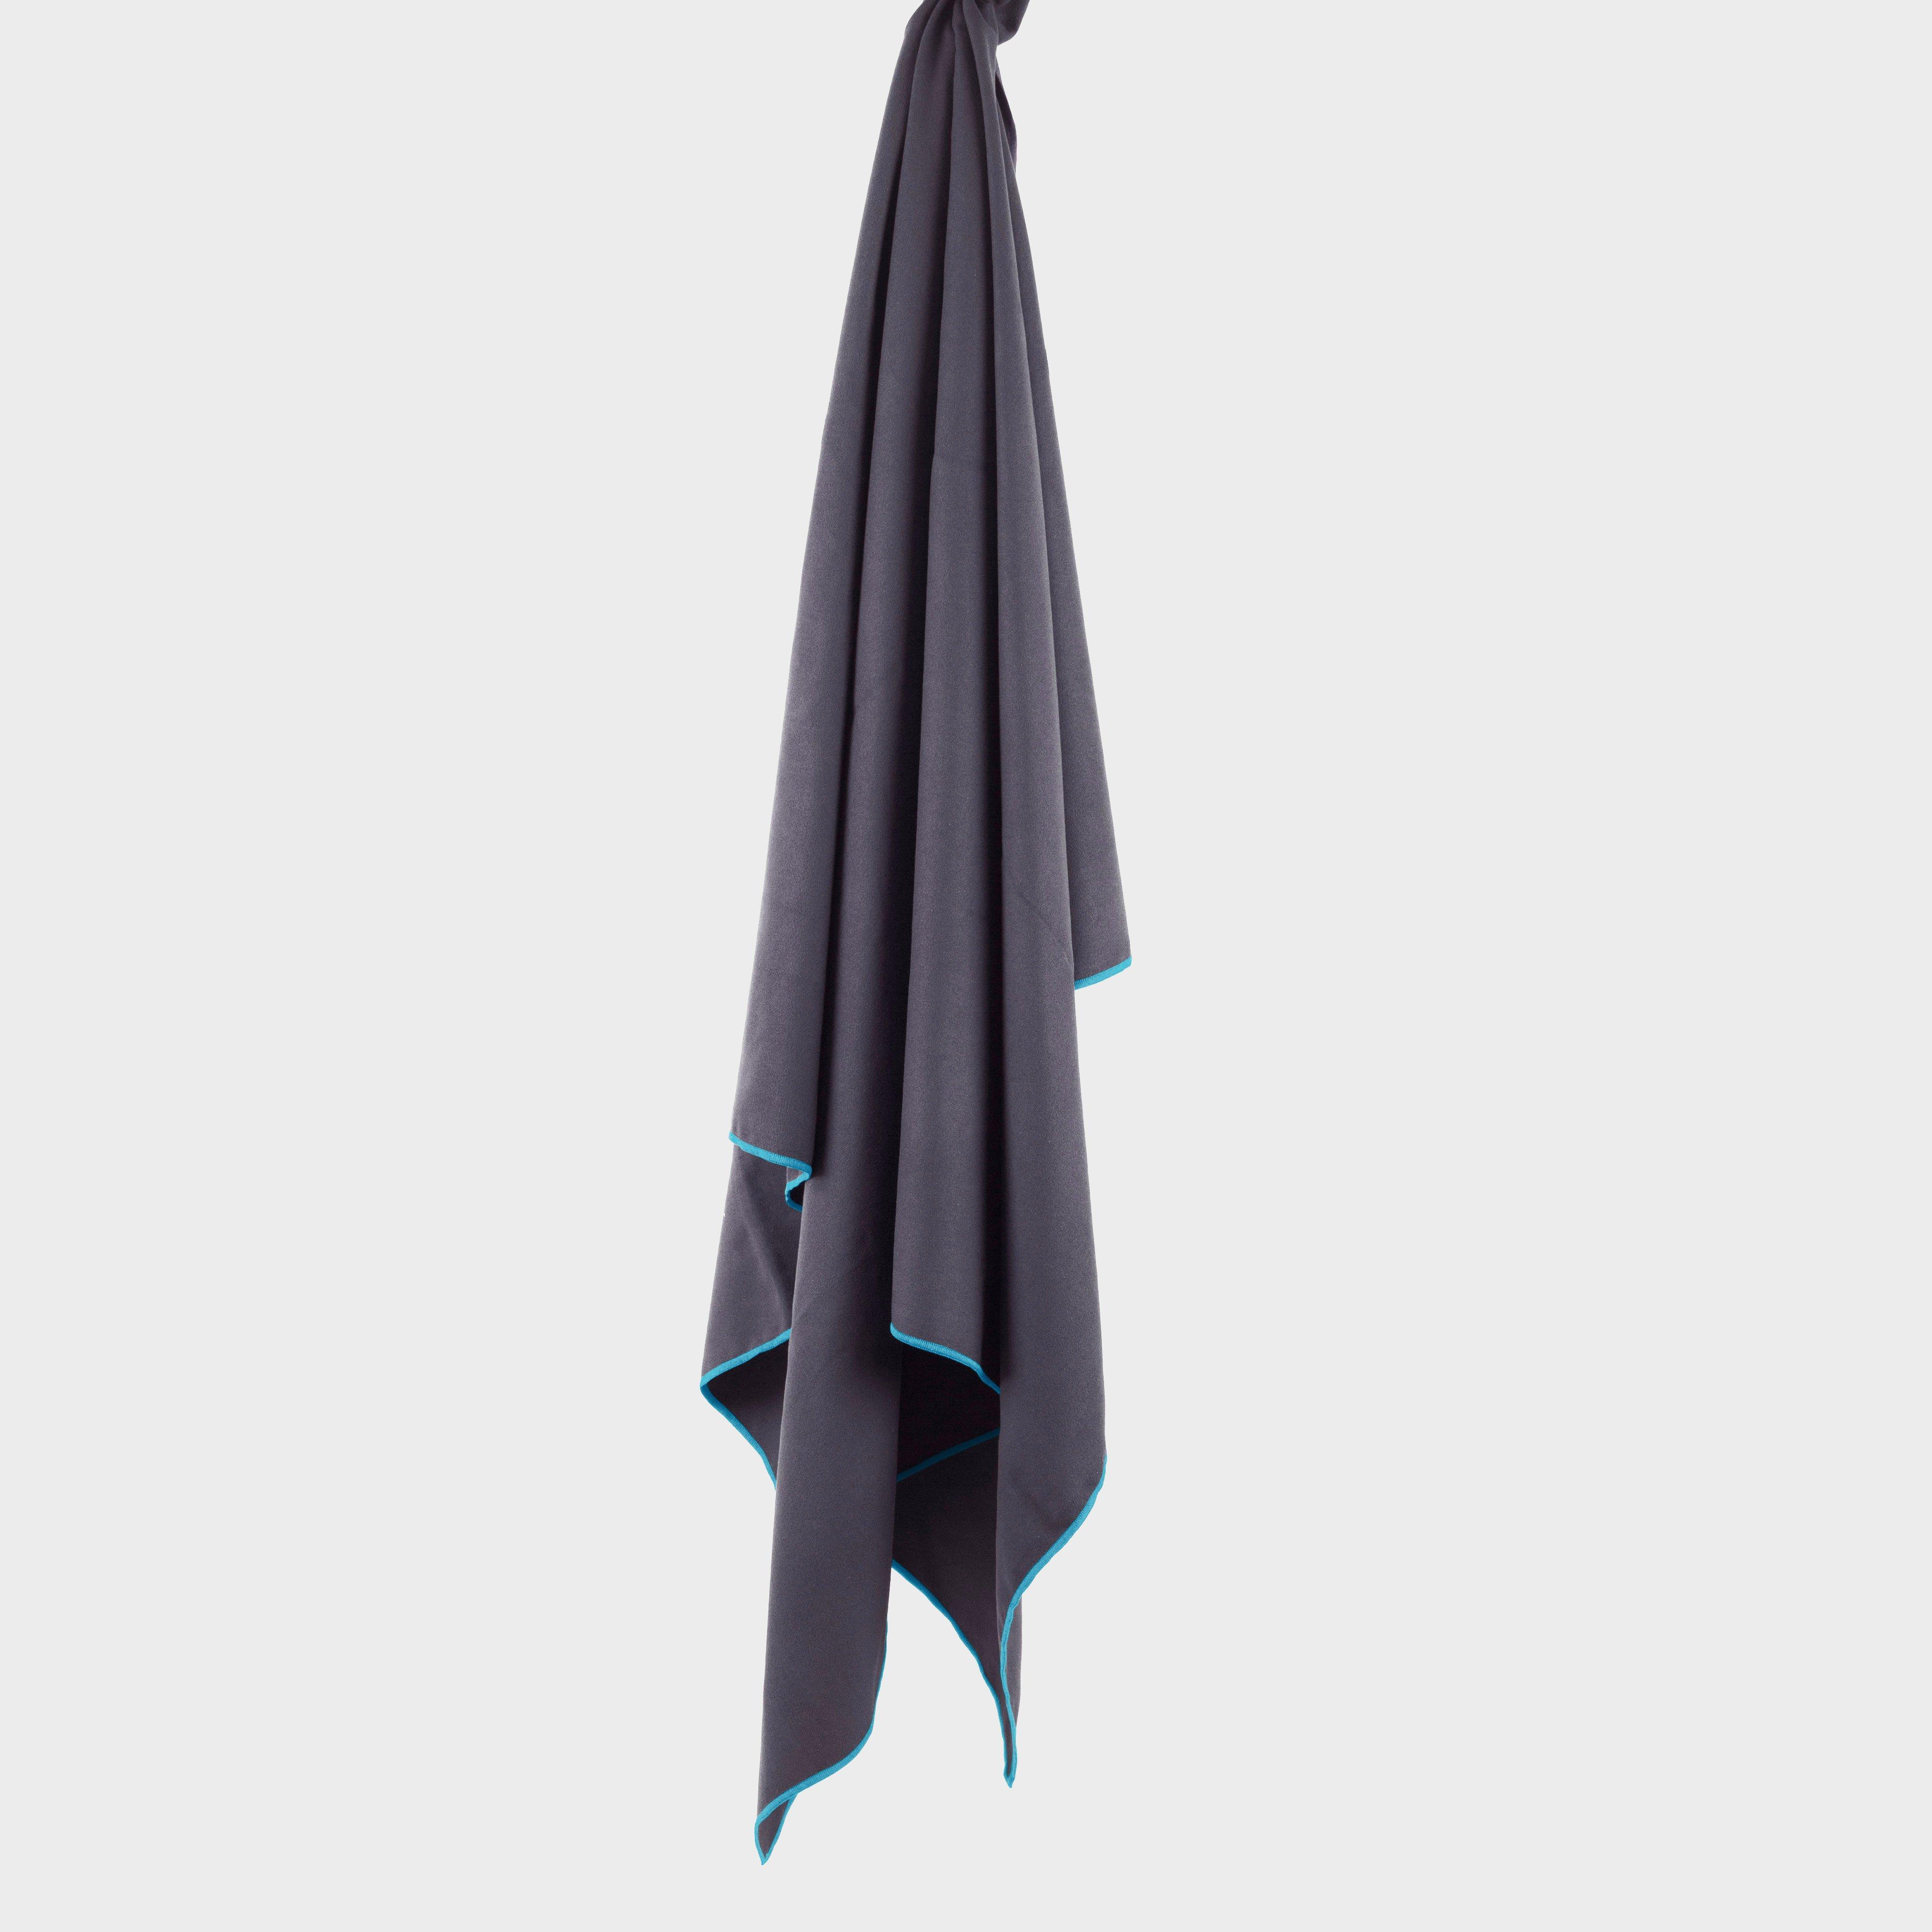 Lifeventure Lifeventure Softfibre Lite Grey Travel Towel (Large), Grey